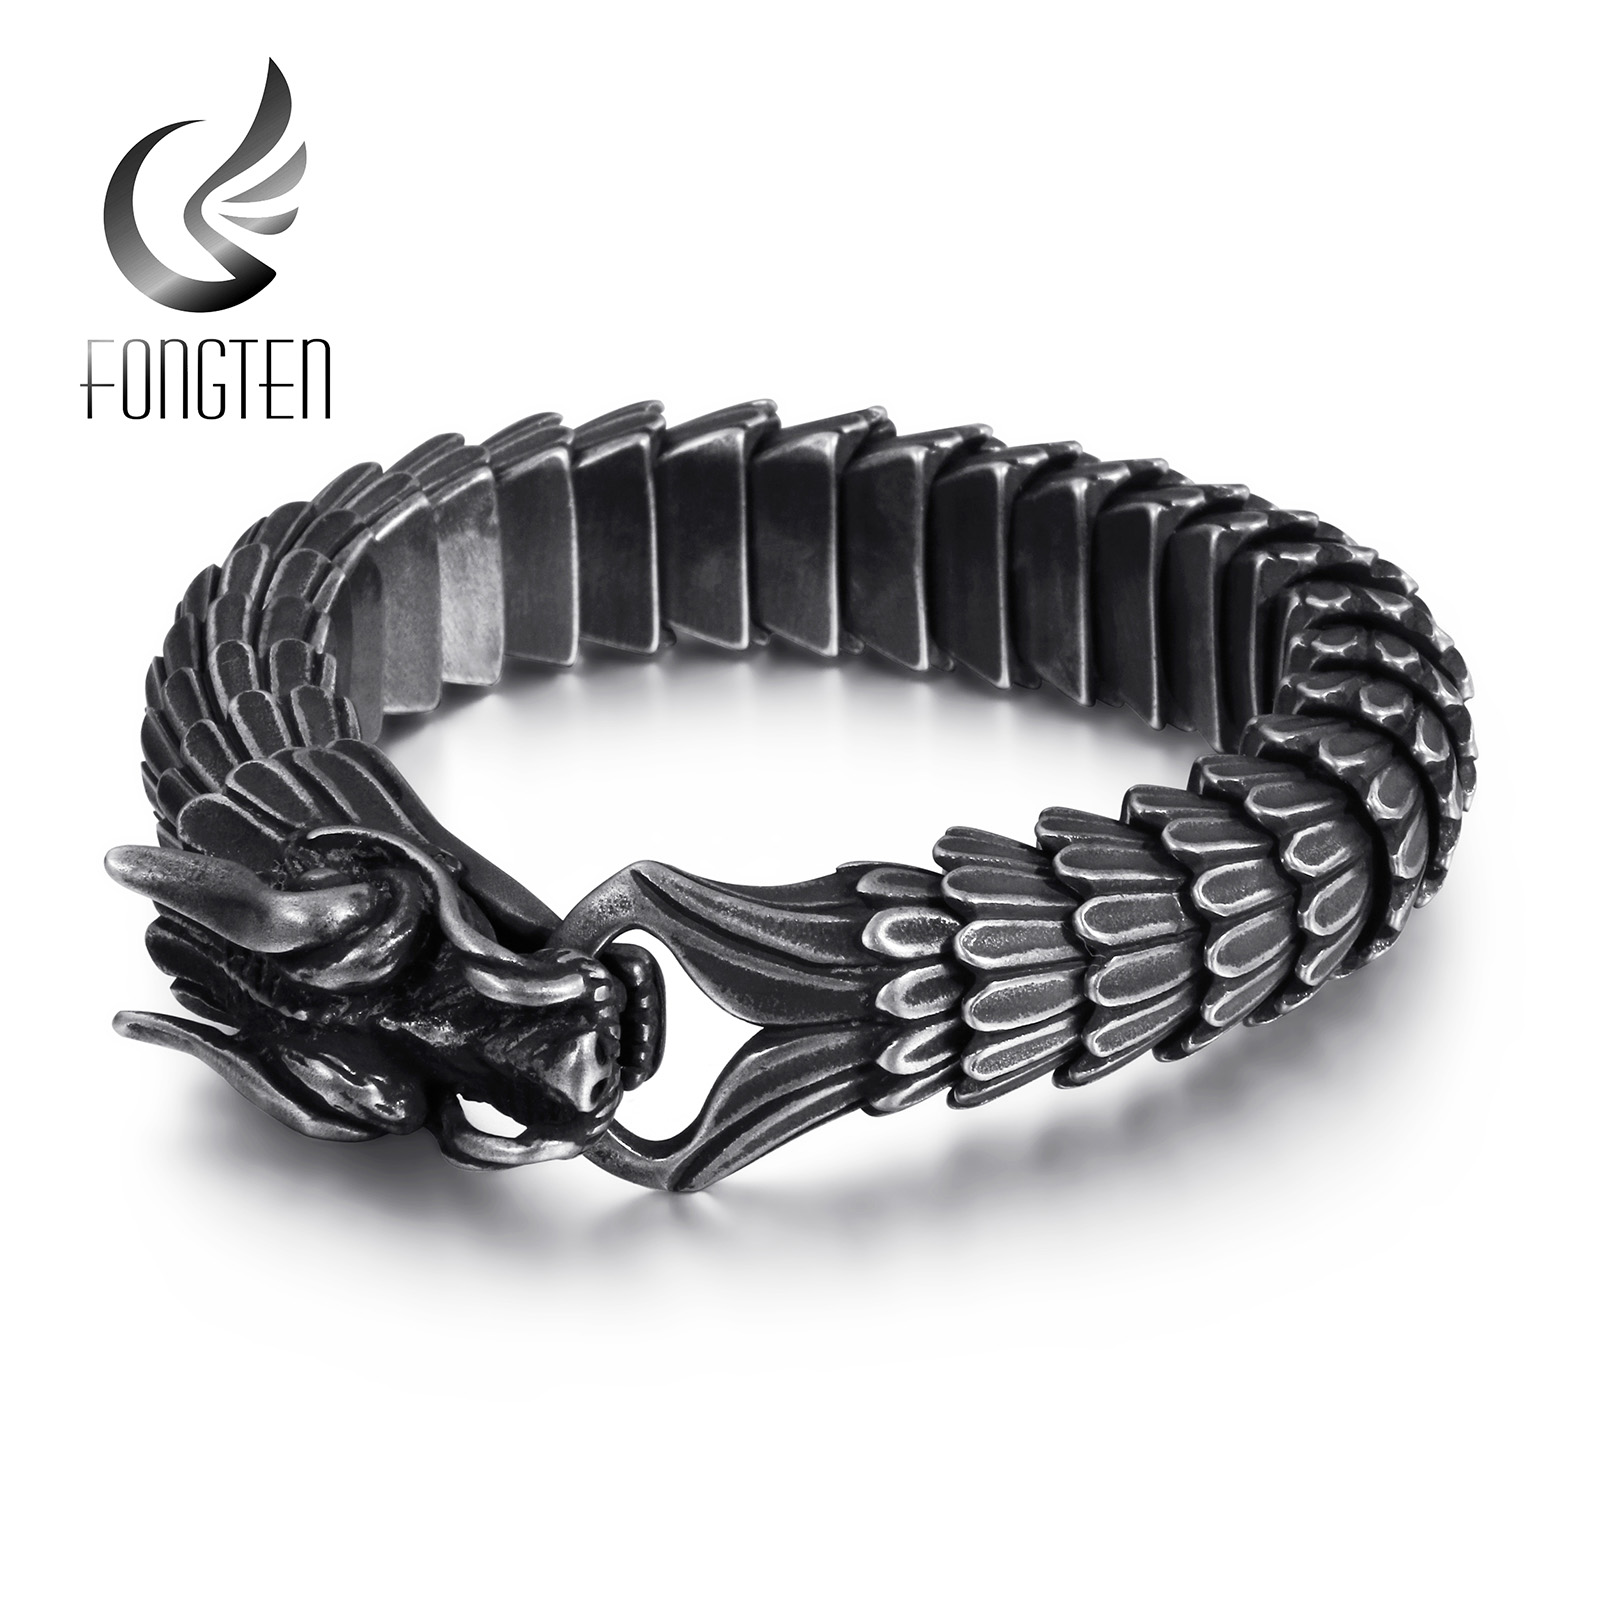 Fongten Dragon Link Chain Bracelet Men Biker Viking Stainless Steel Punk Mens Old Metal Vintage Bangles Jewelry Gift 2020